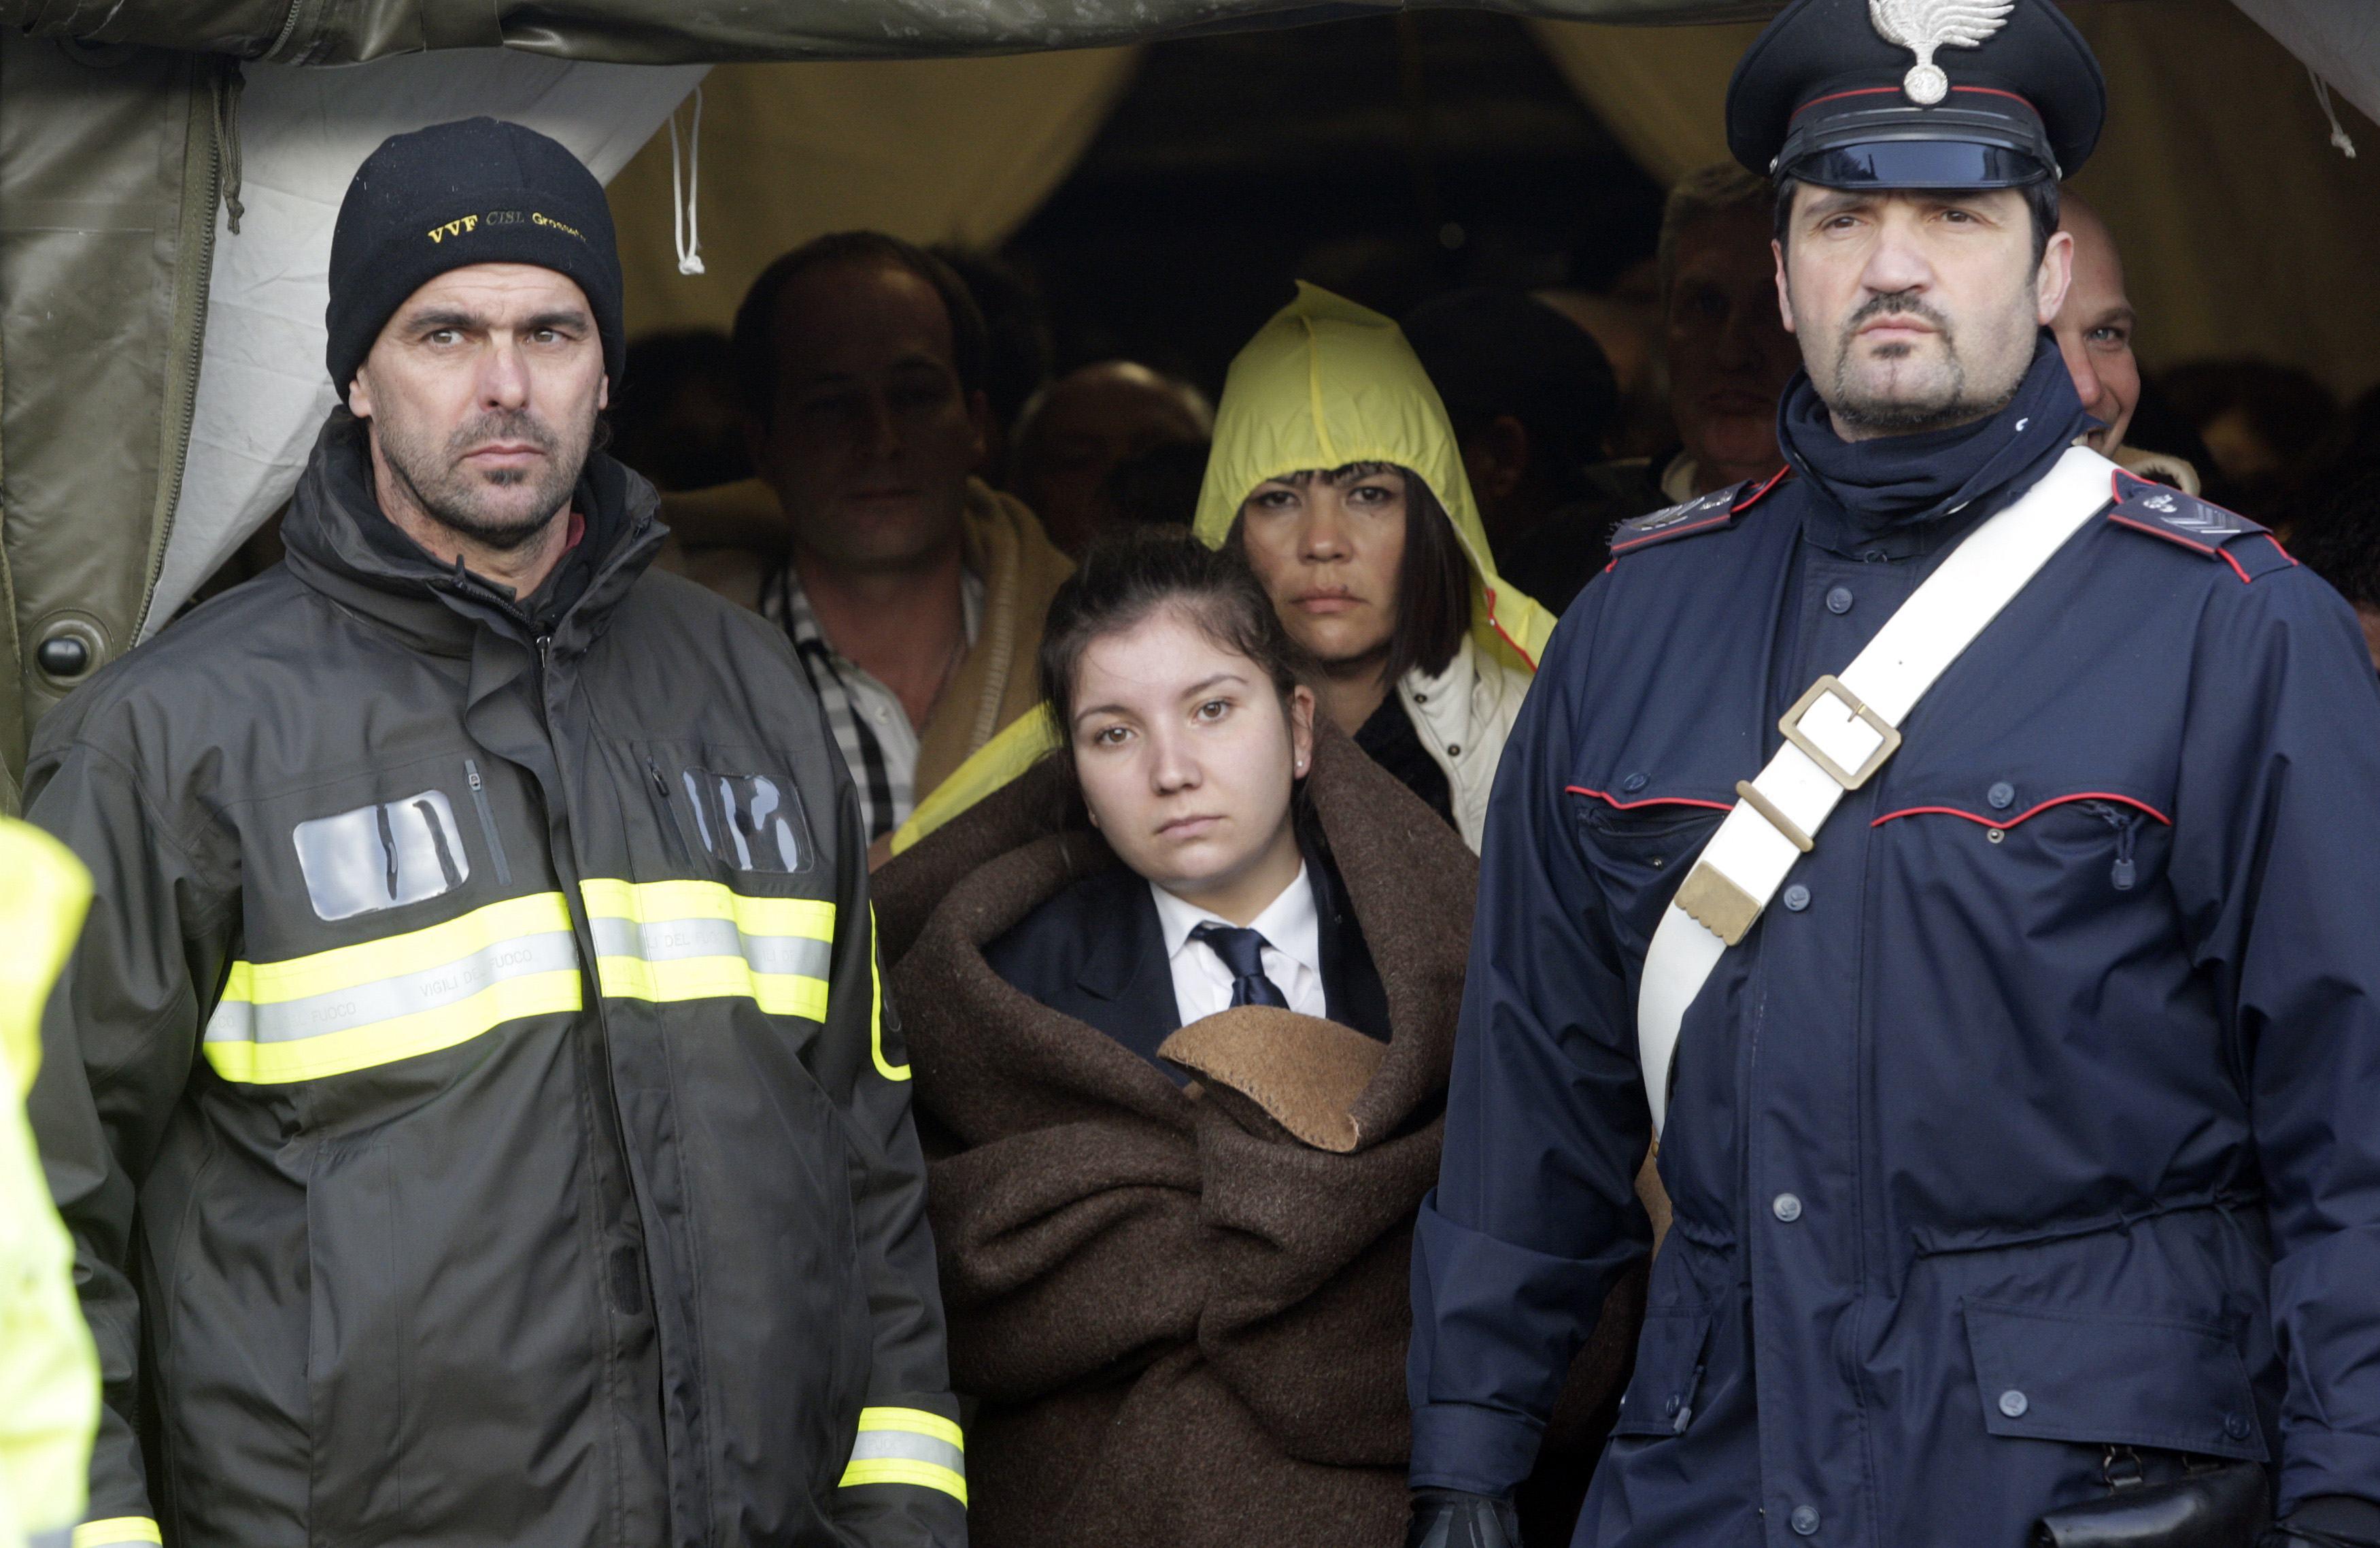 Reuters / Remo Casilli